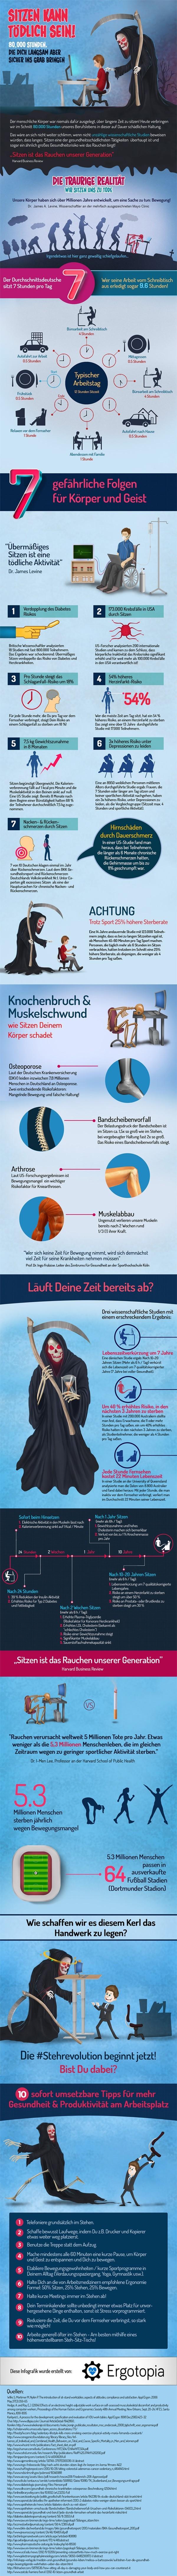 Infografik-sitzen-kann-toedlich-sein